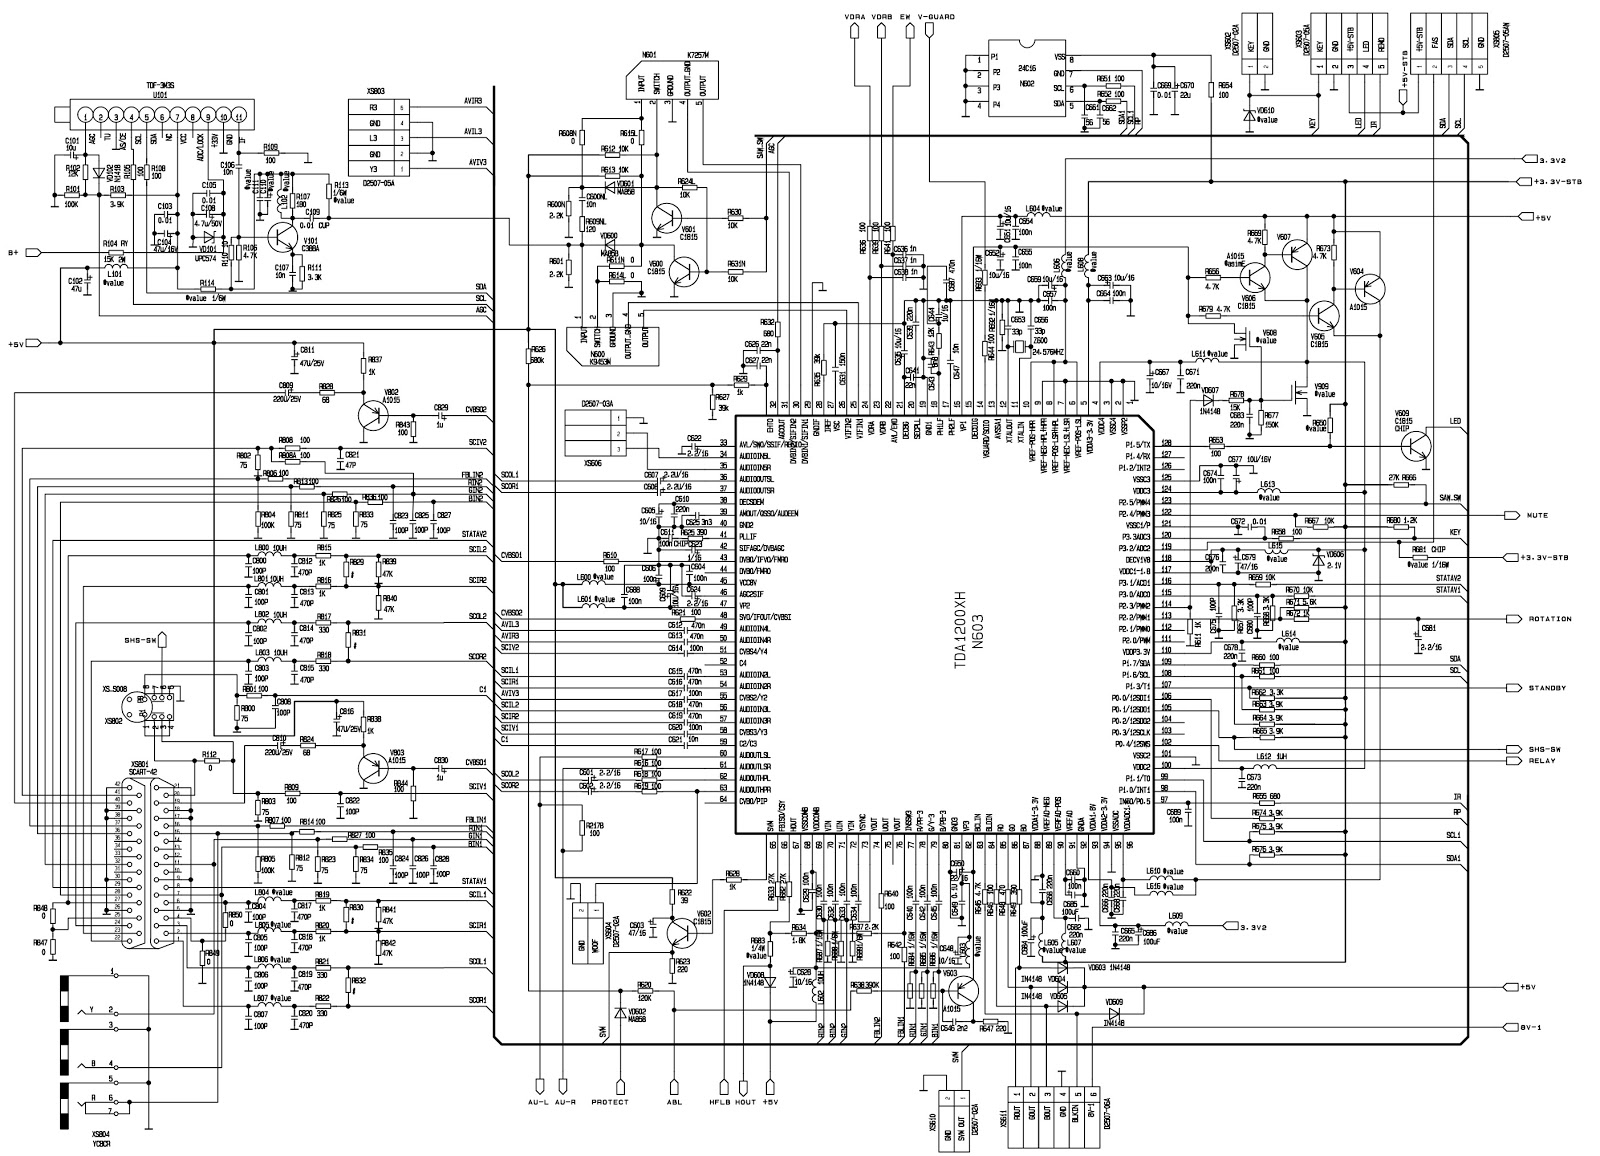 KP29TK207 – Konka 29 inch CRT TV – Circuit diagram – STR-CQ1265RT